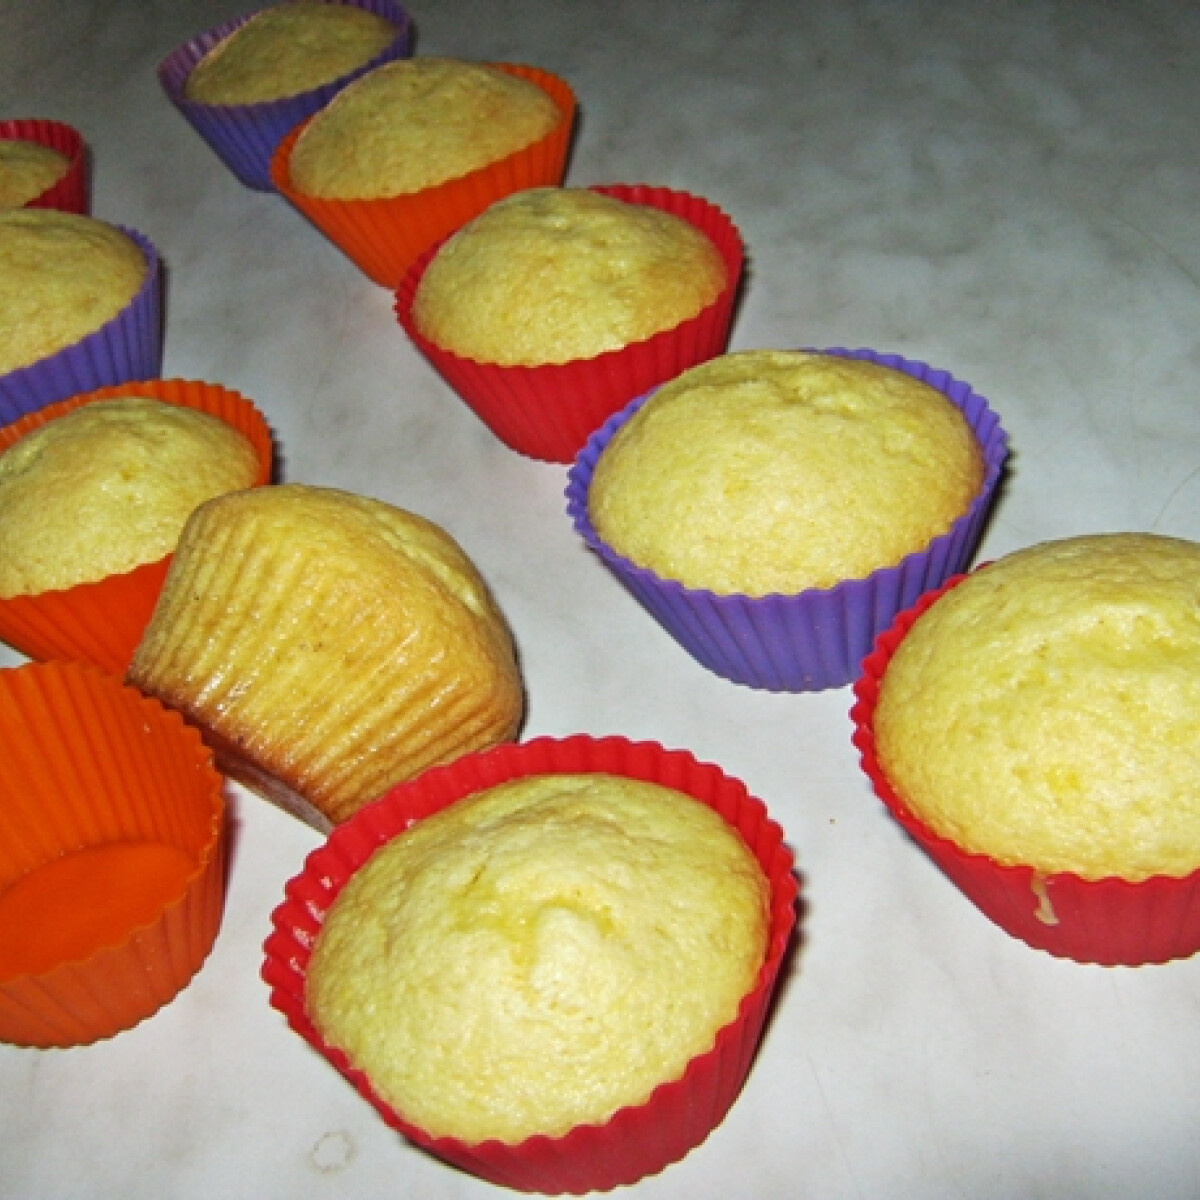 Ezen a képen: Elronthatatlan muffin alap